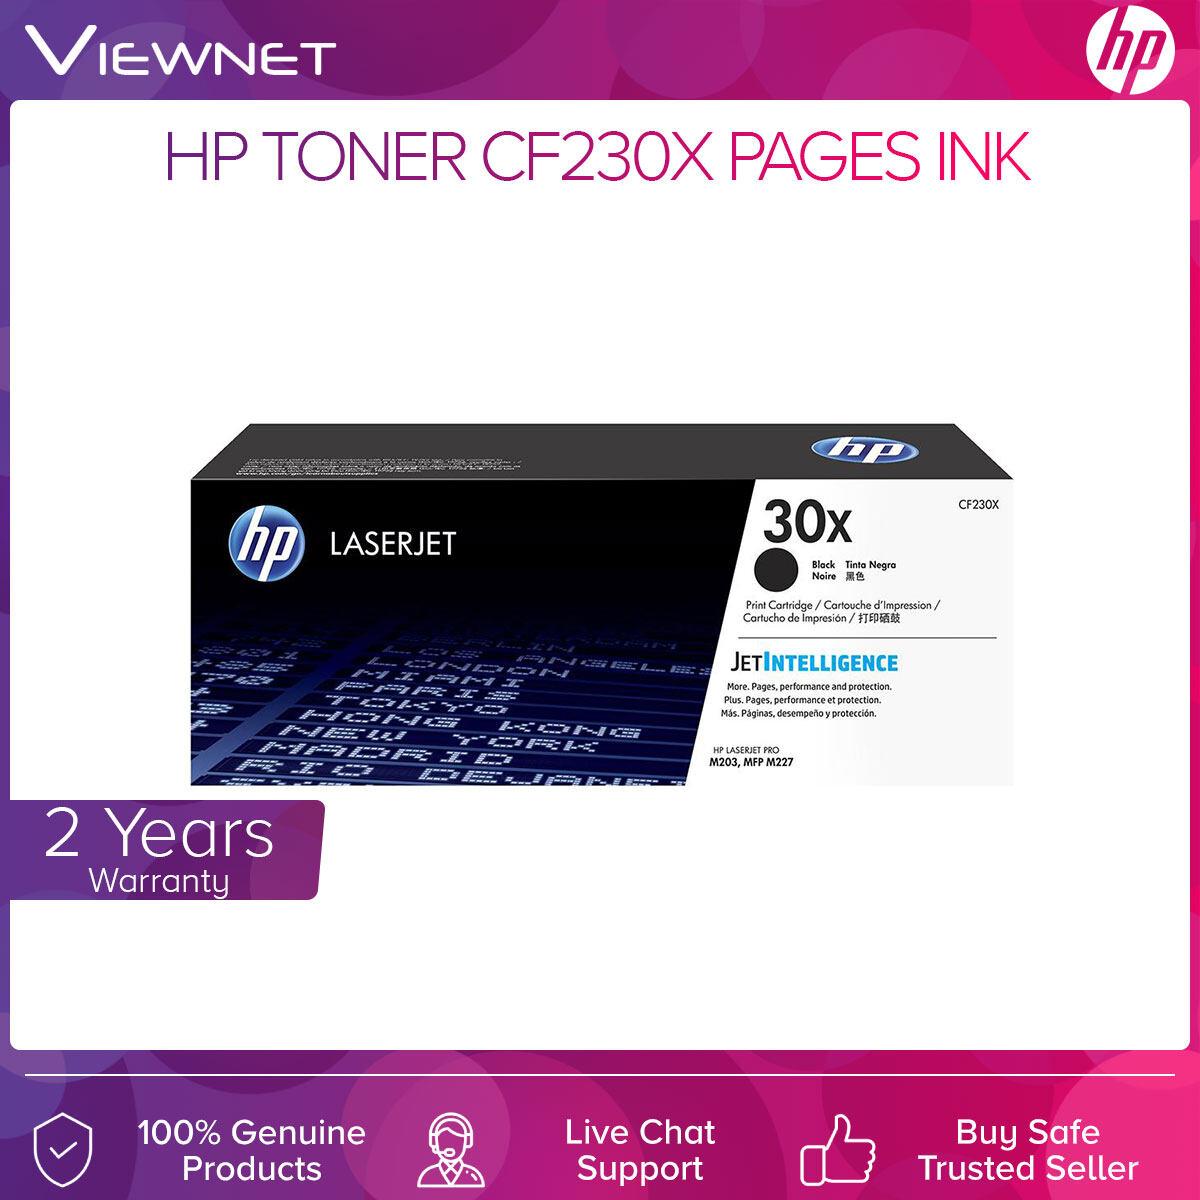 HP Toner CF230X/30X 3500 Pages Ink (Black)